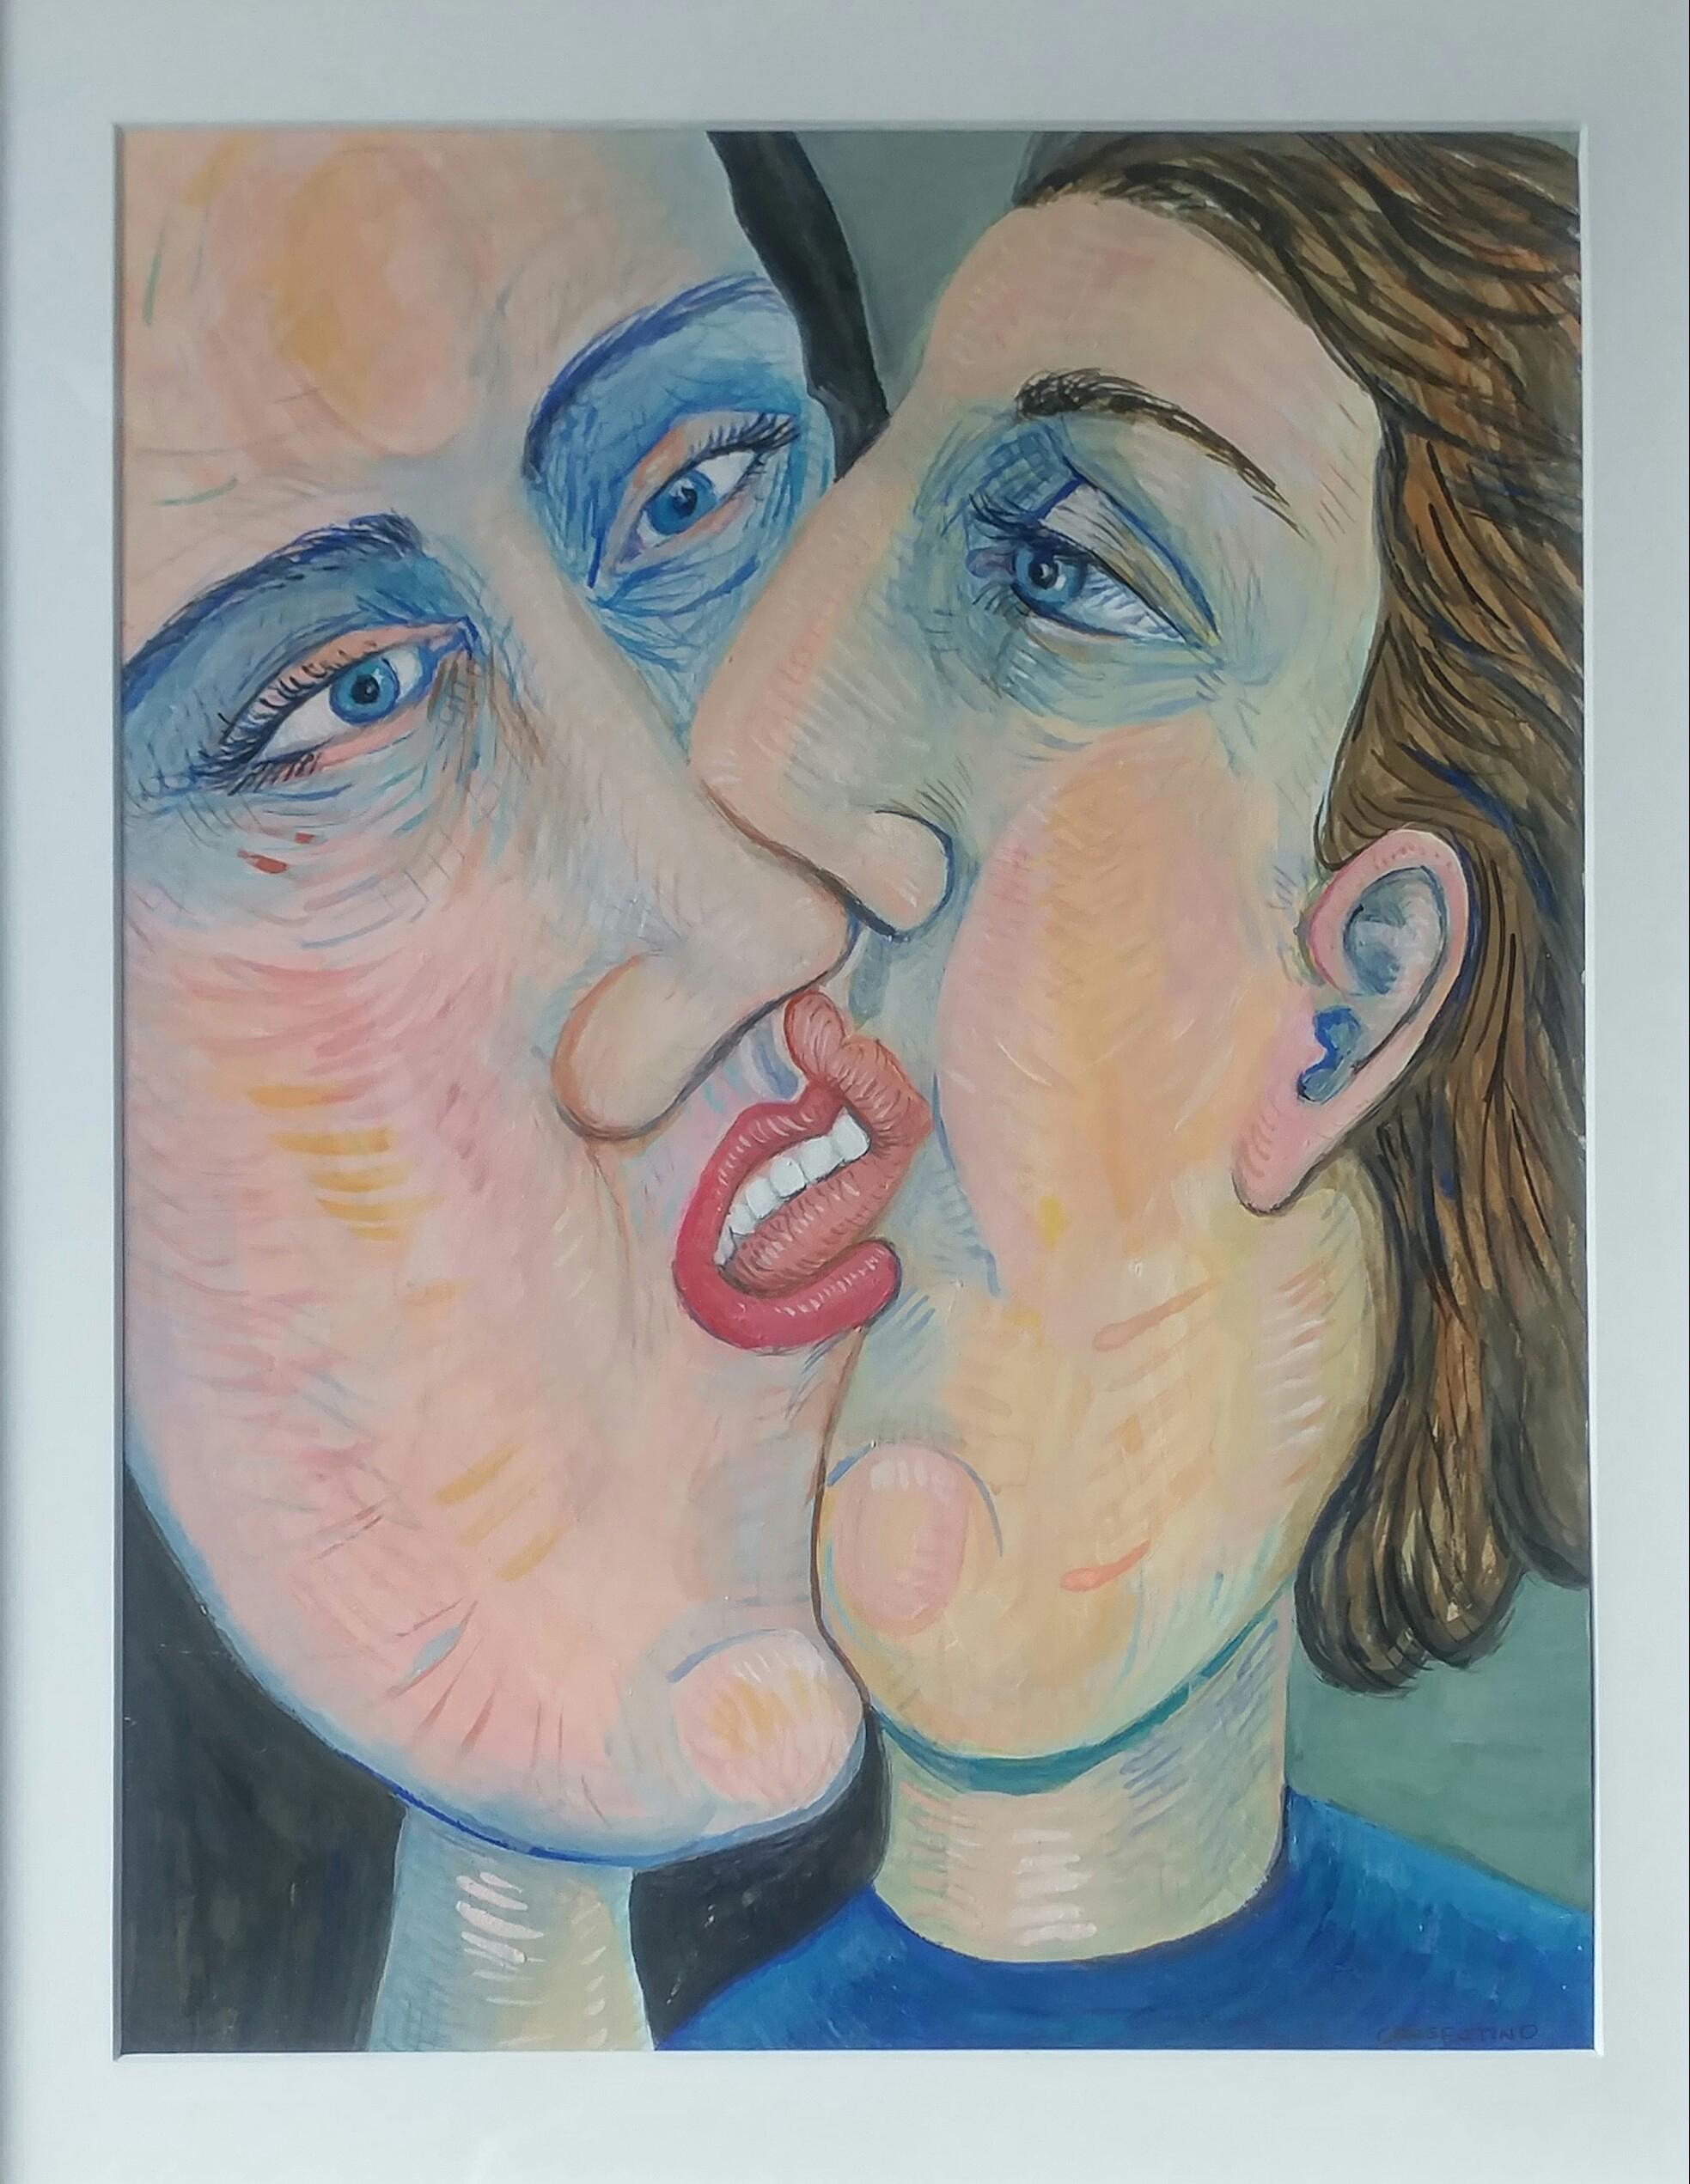 Couple kissing close.